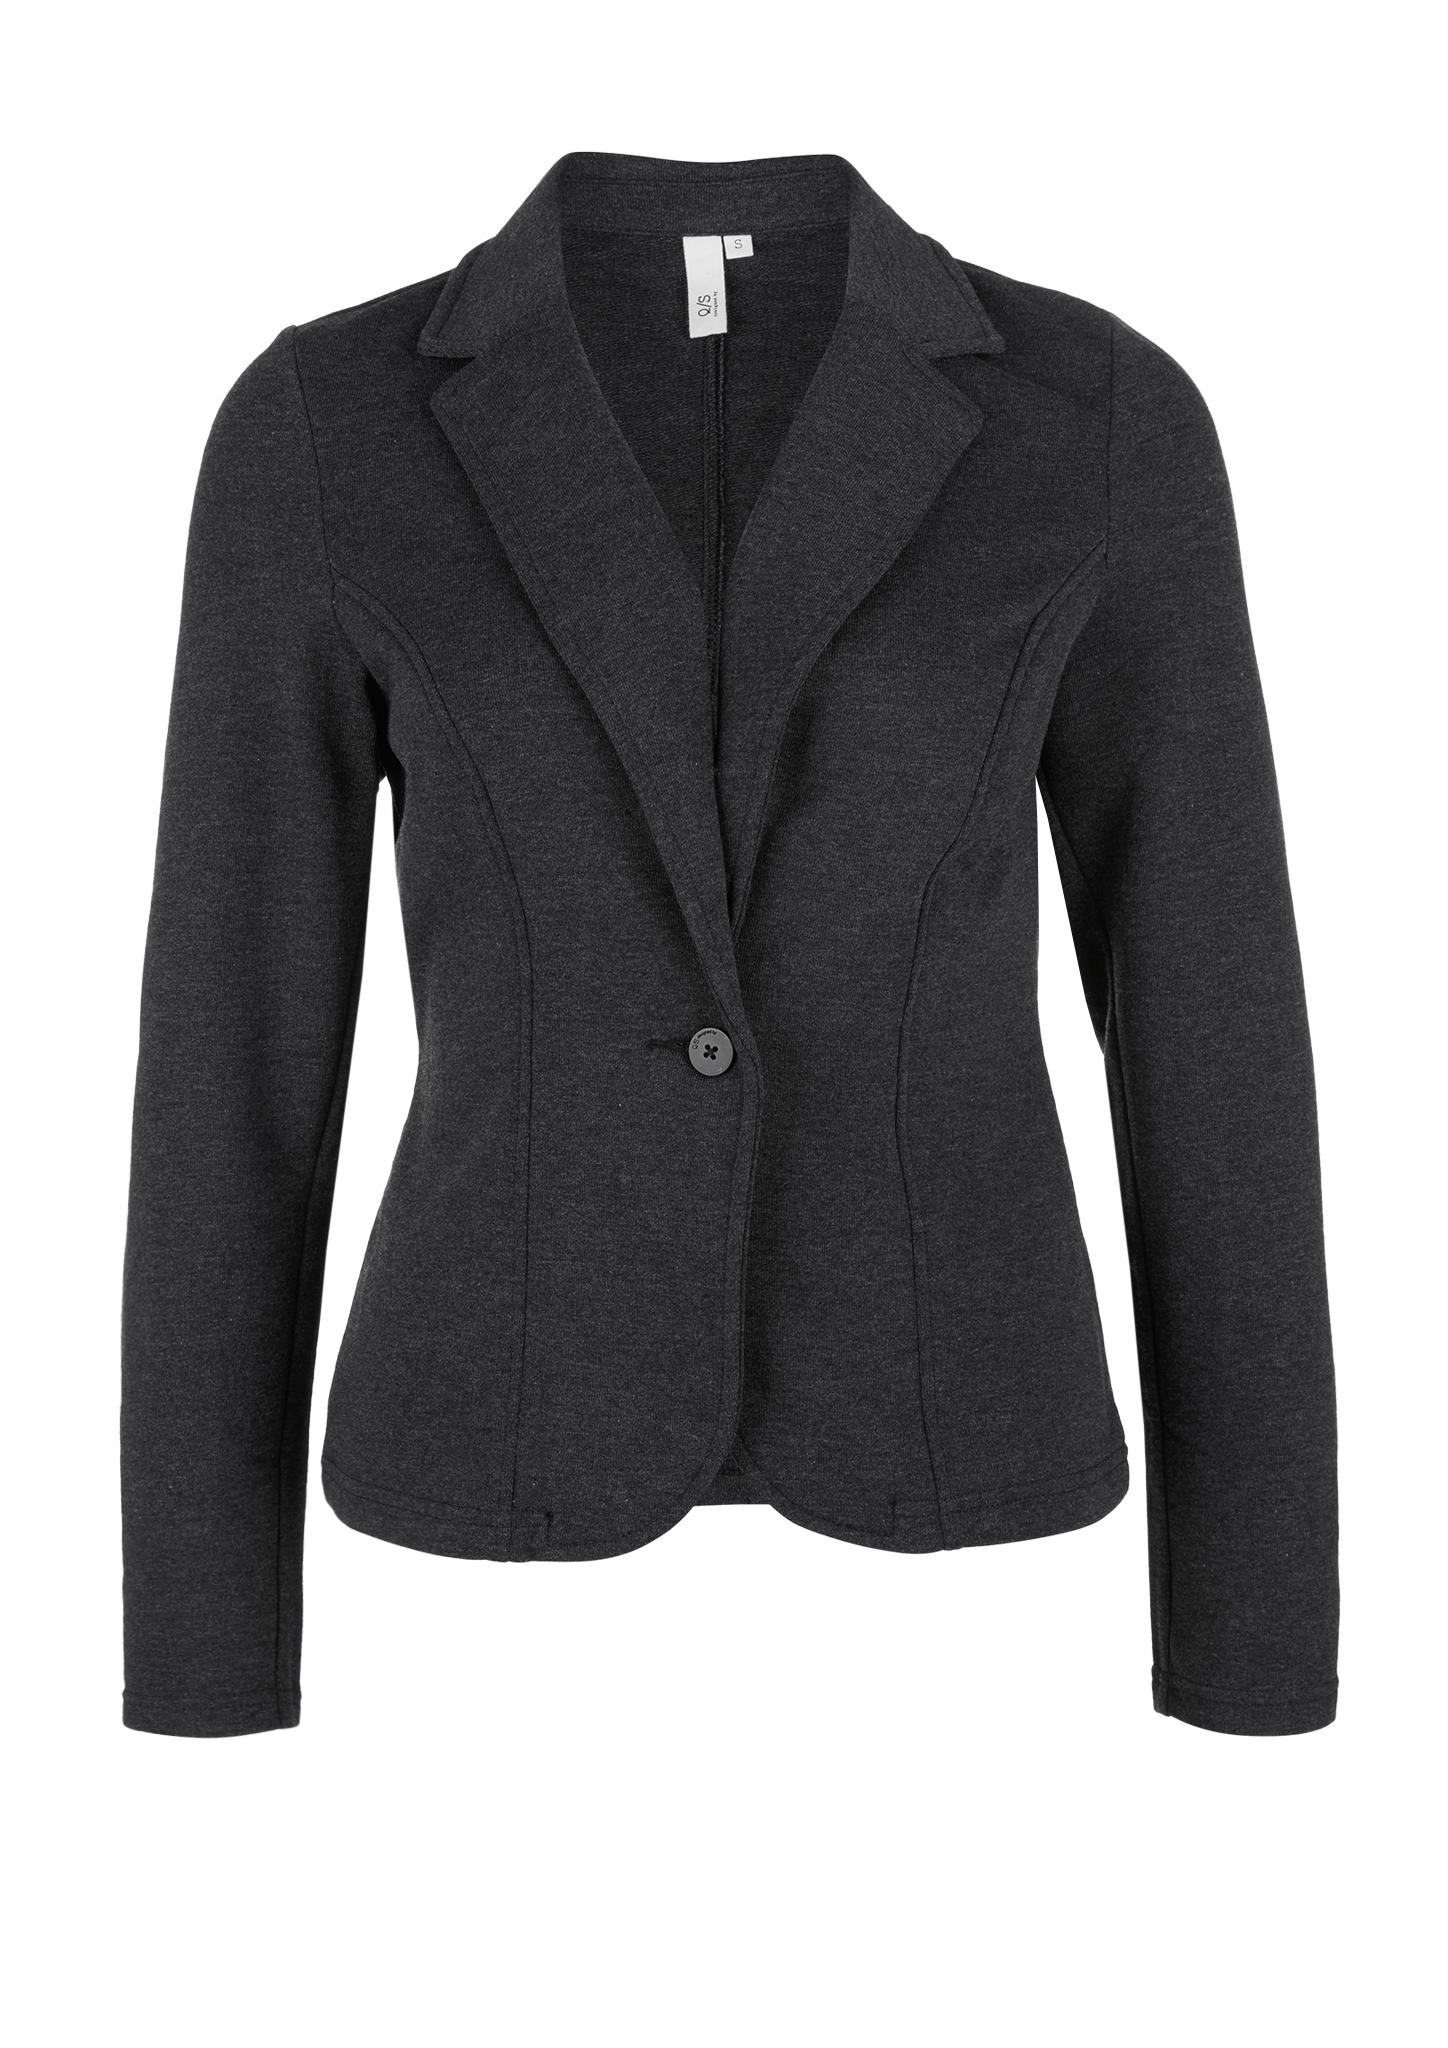 Sweatblazer | Bekleidung > Blazer > Sweatblazer | Q/S designed by